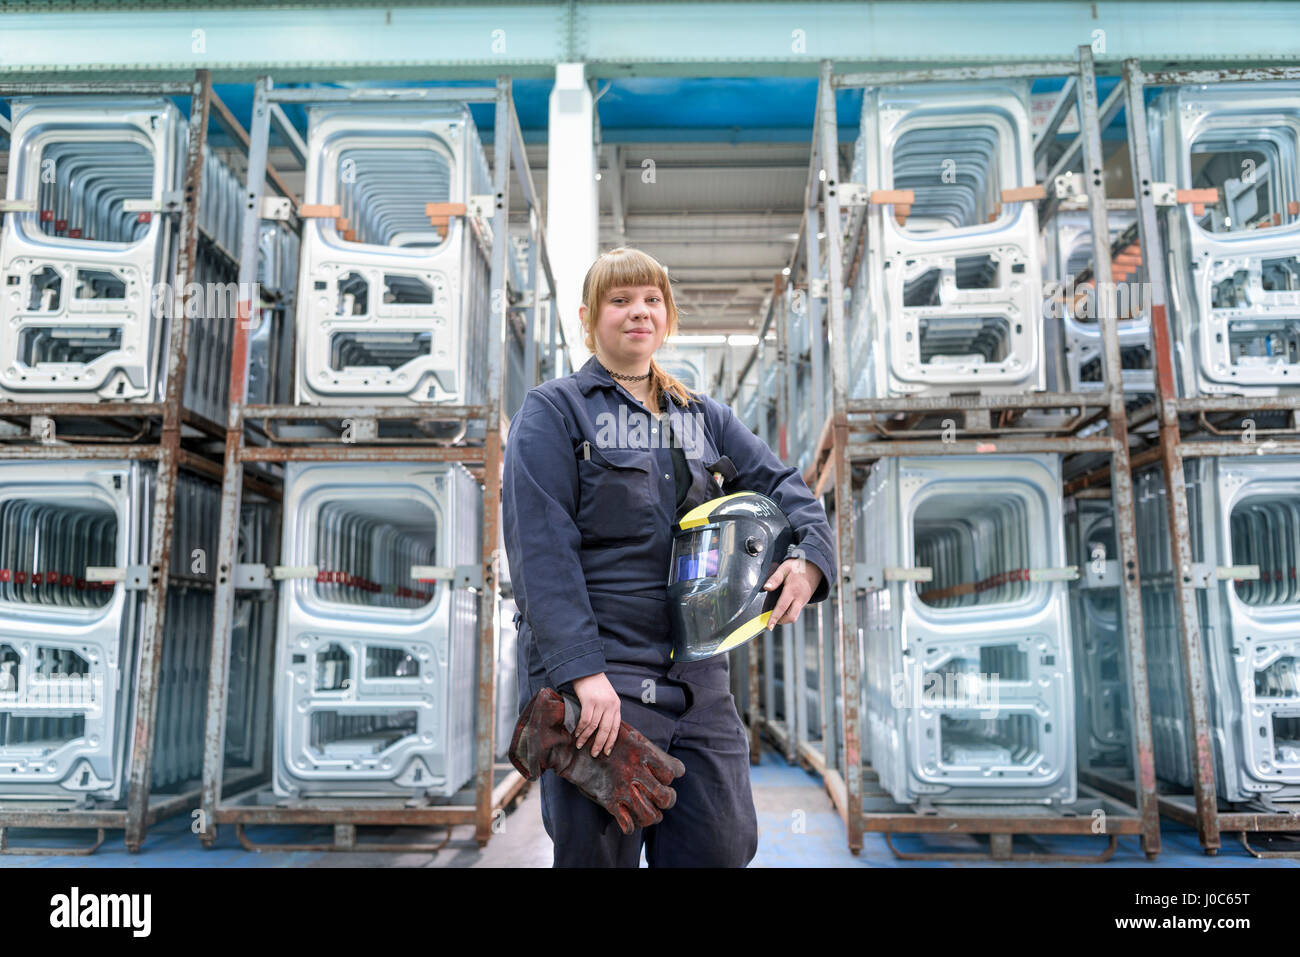 Female apprentice welder holding equipment in car factory, portrait - Stock Image